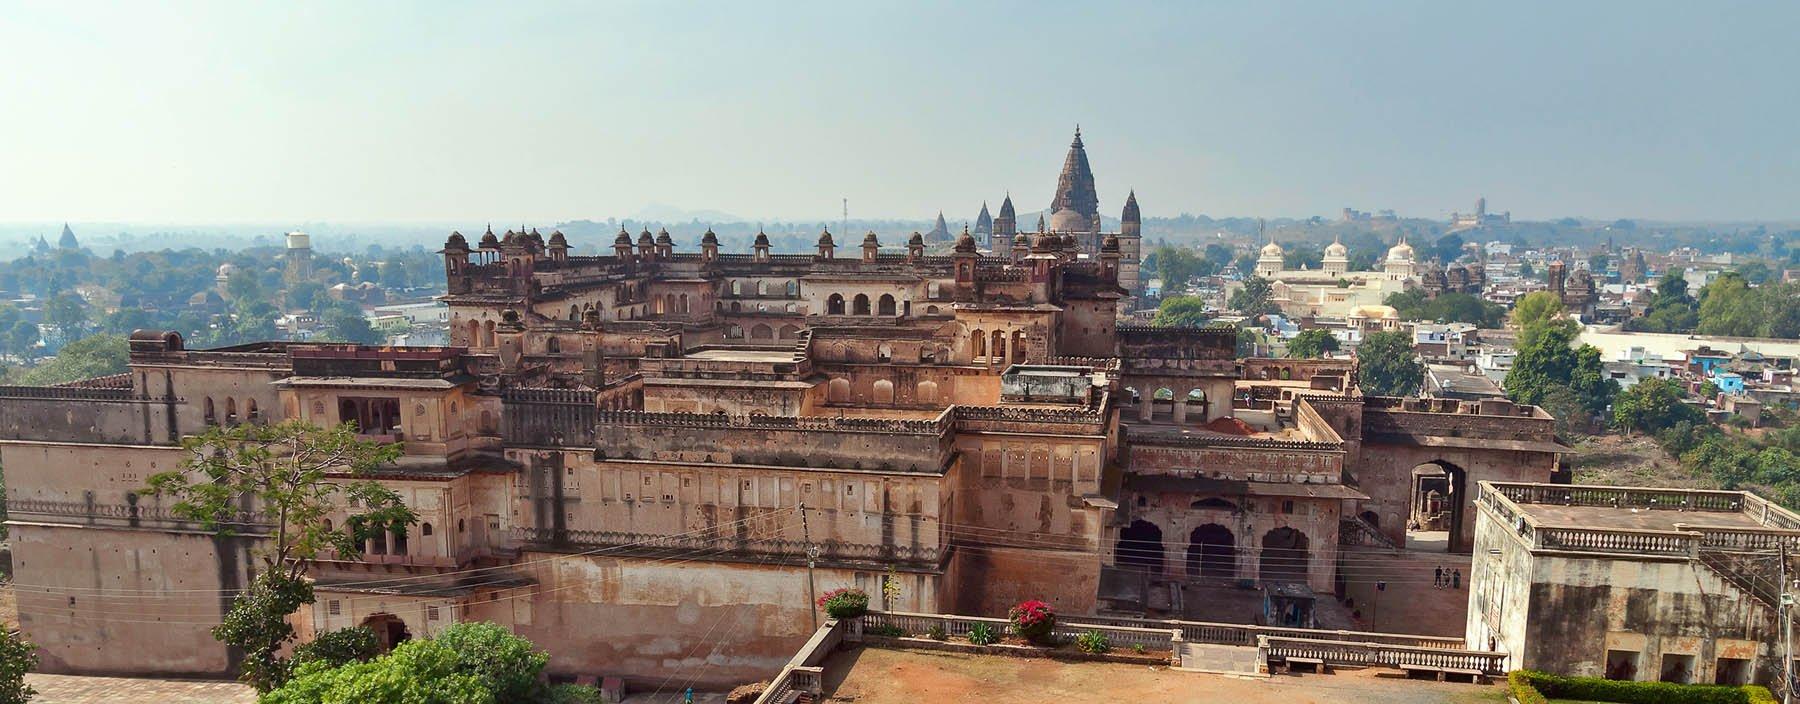 in, orchha, view of raj mahal palace.jpg